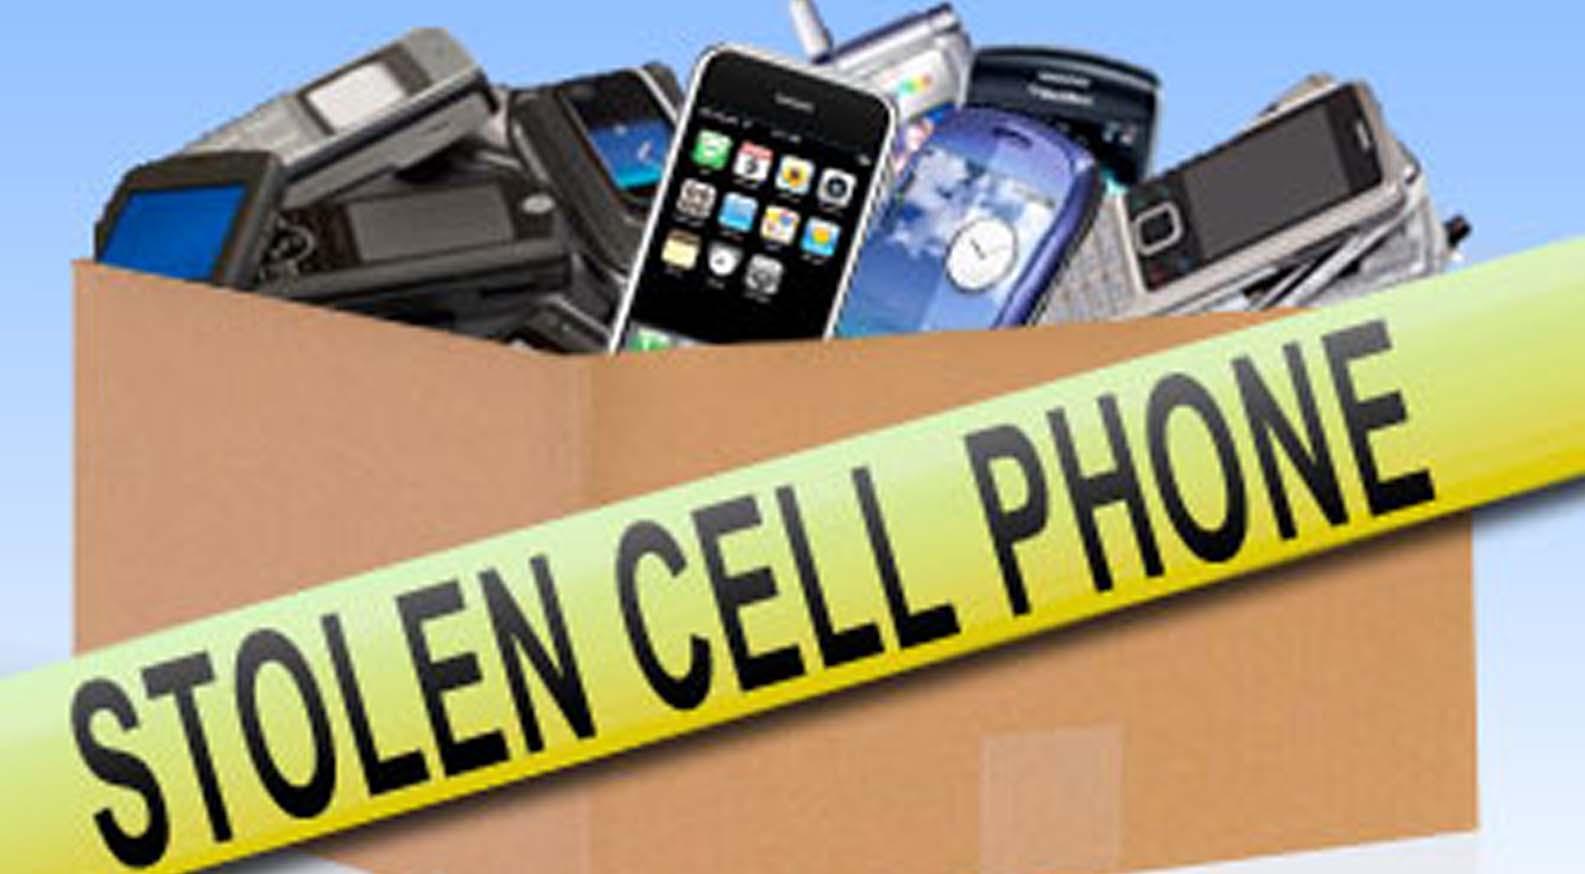 Stolen Cell phones